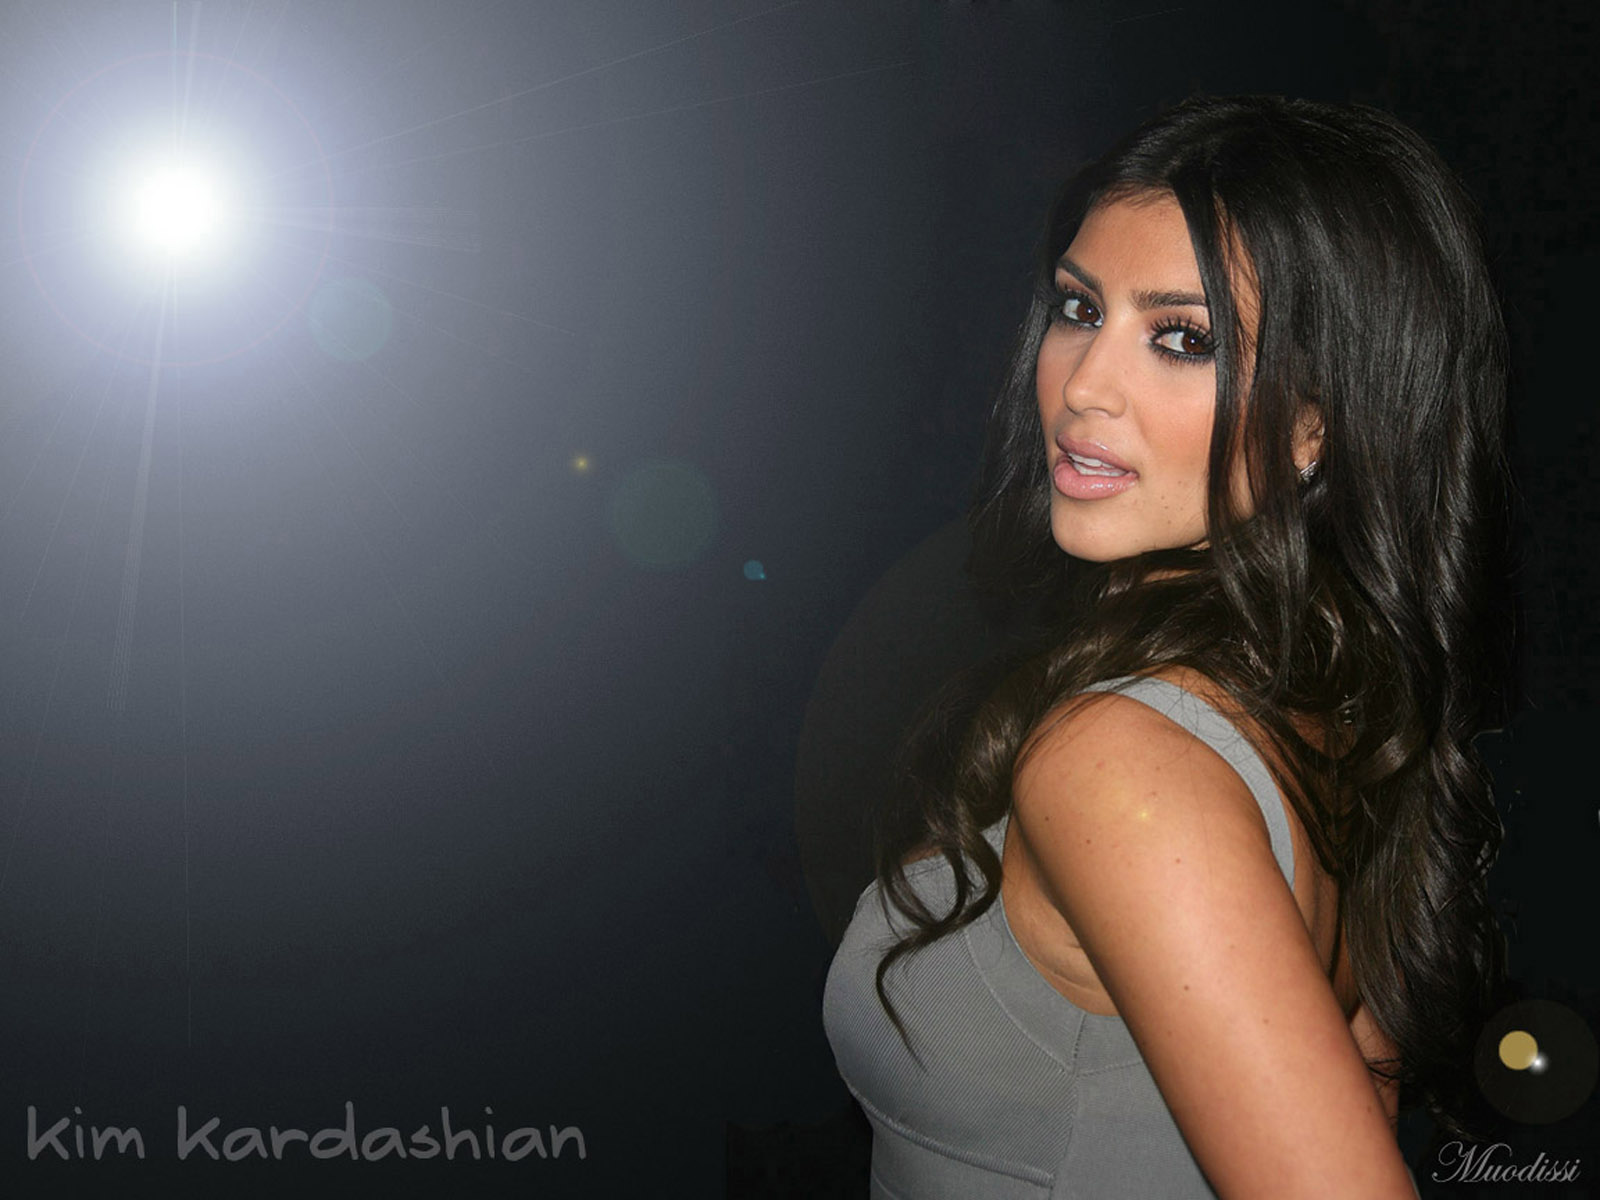 Kim Kardashian Widescreen Gallery 540798857 Wallpaper for Free